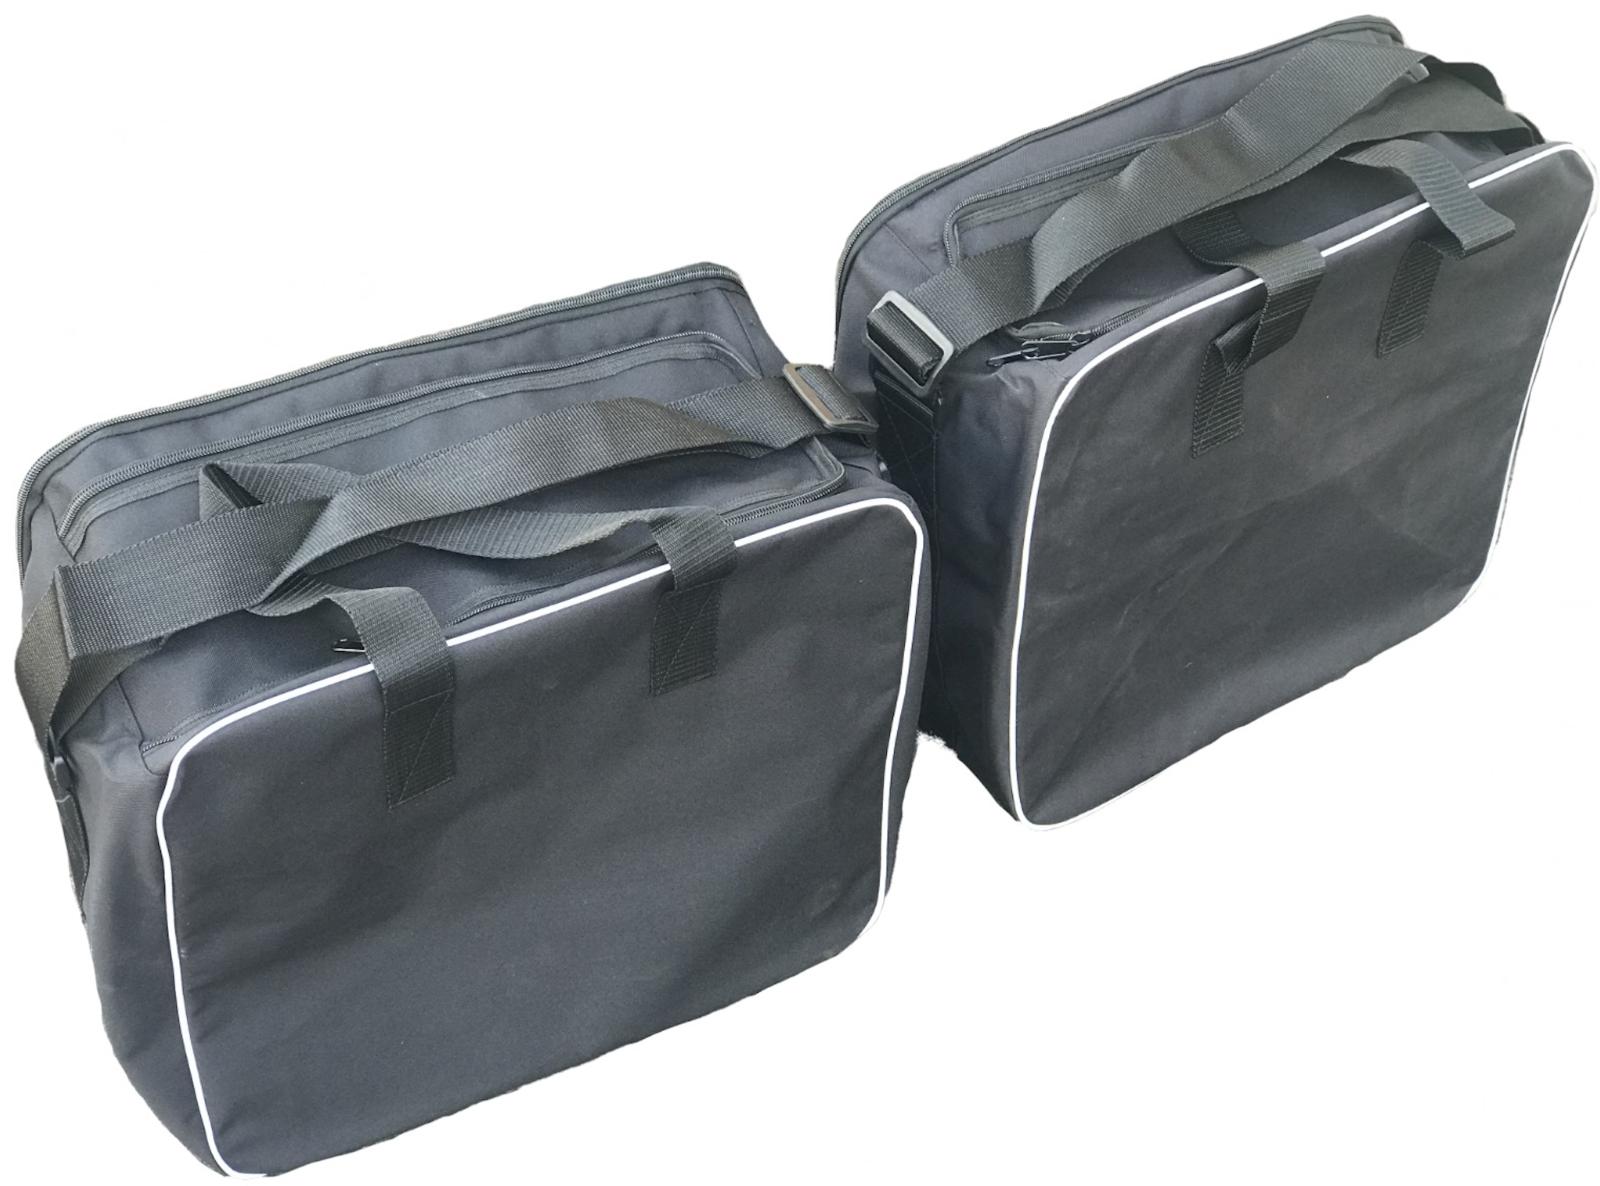 INNER LINER BAG LUGGAGE BAG TO FIT HEPCO AND BECKER XPLORER 40 LITRE PANNIER BOX